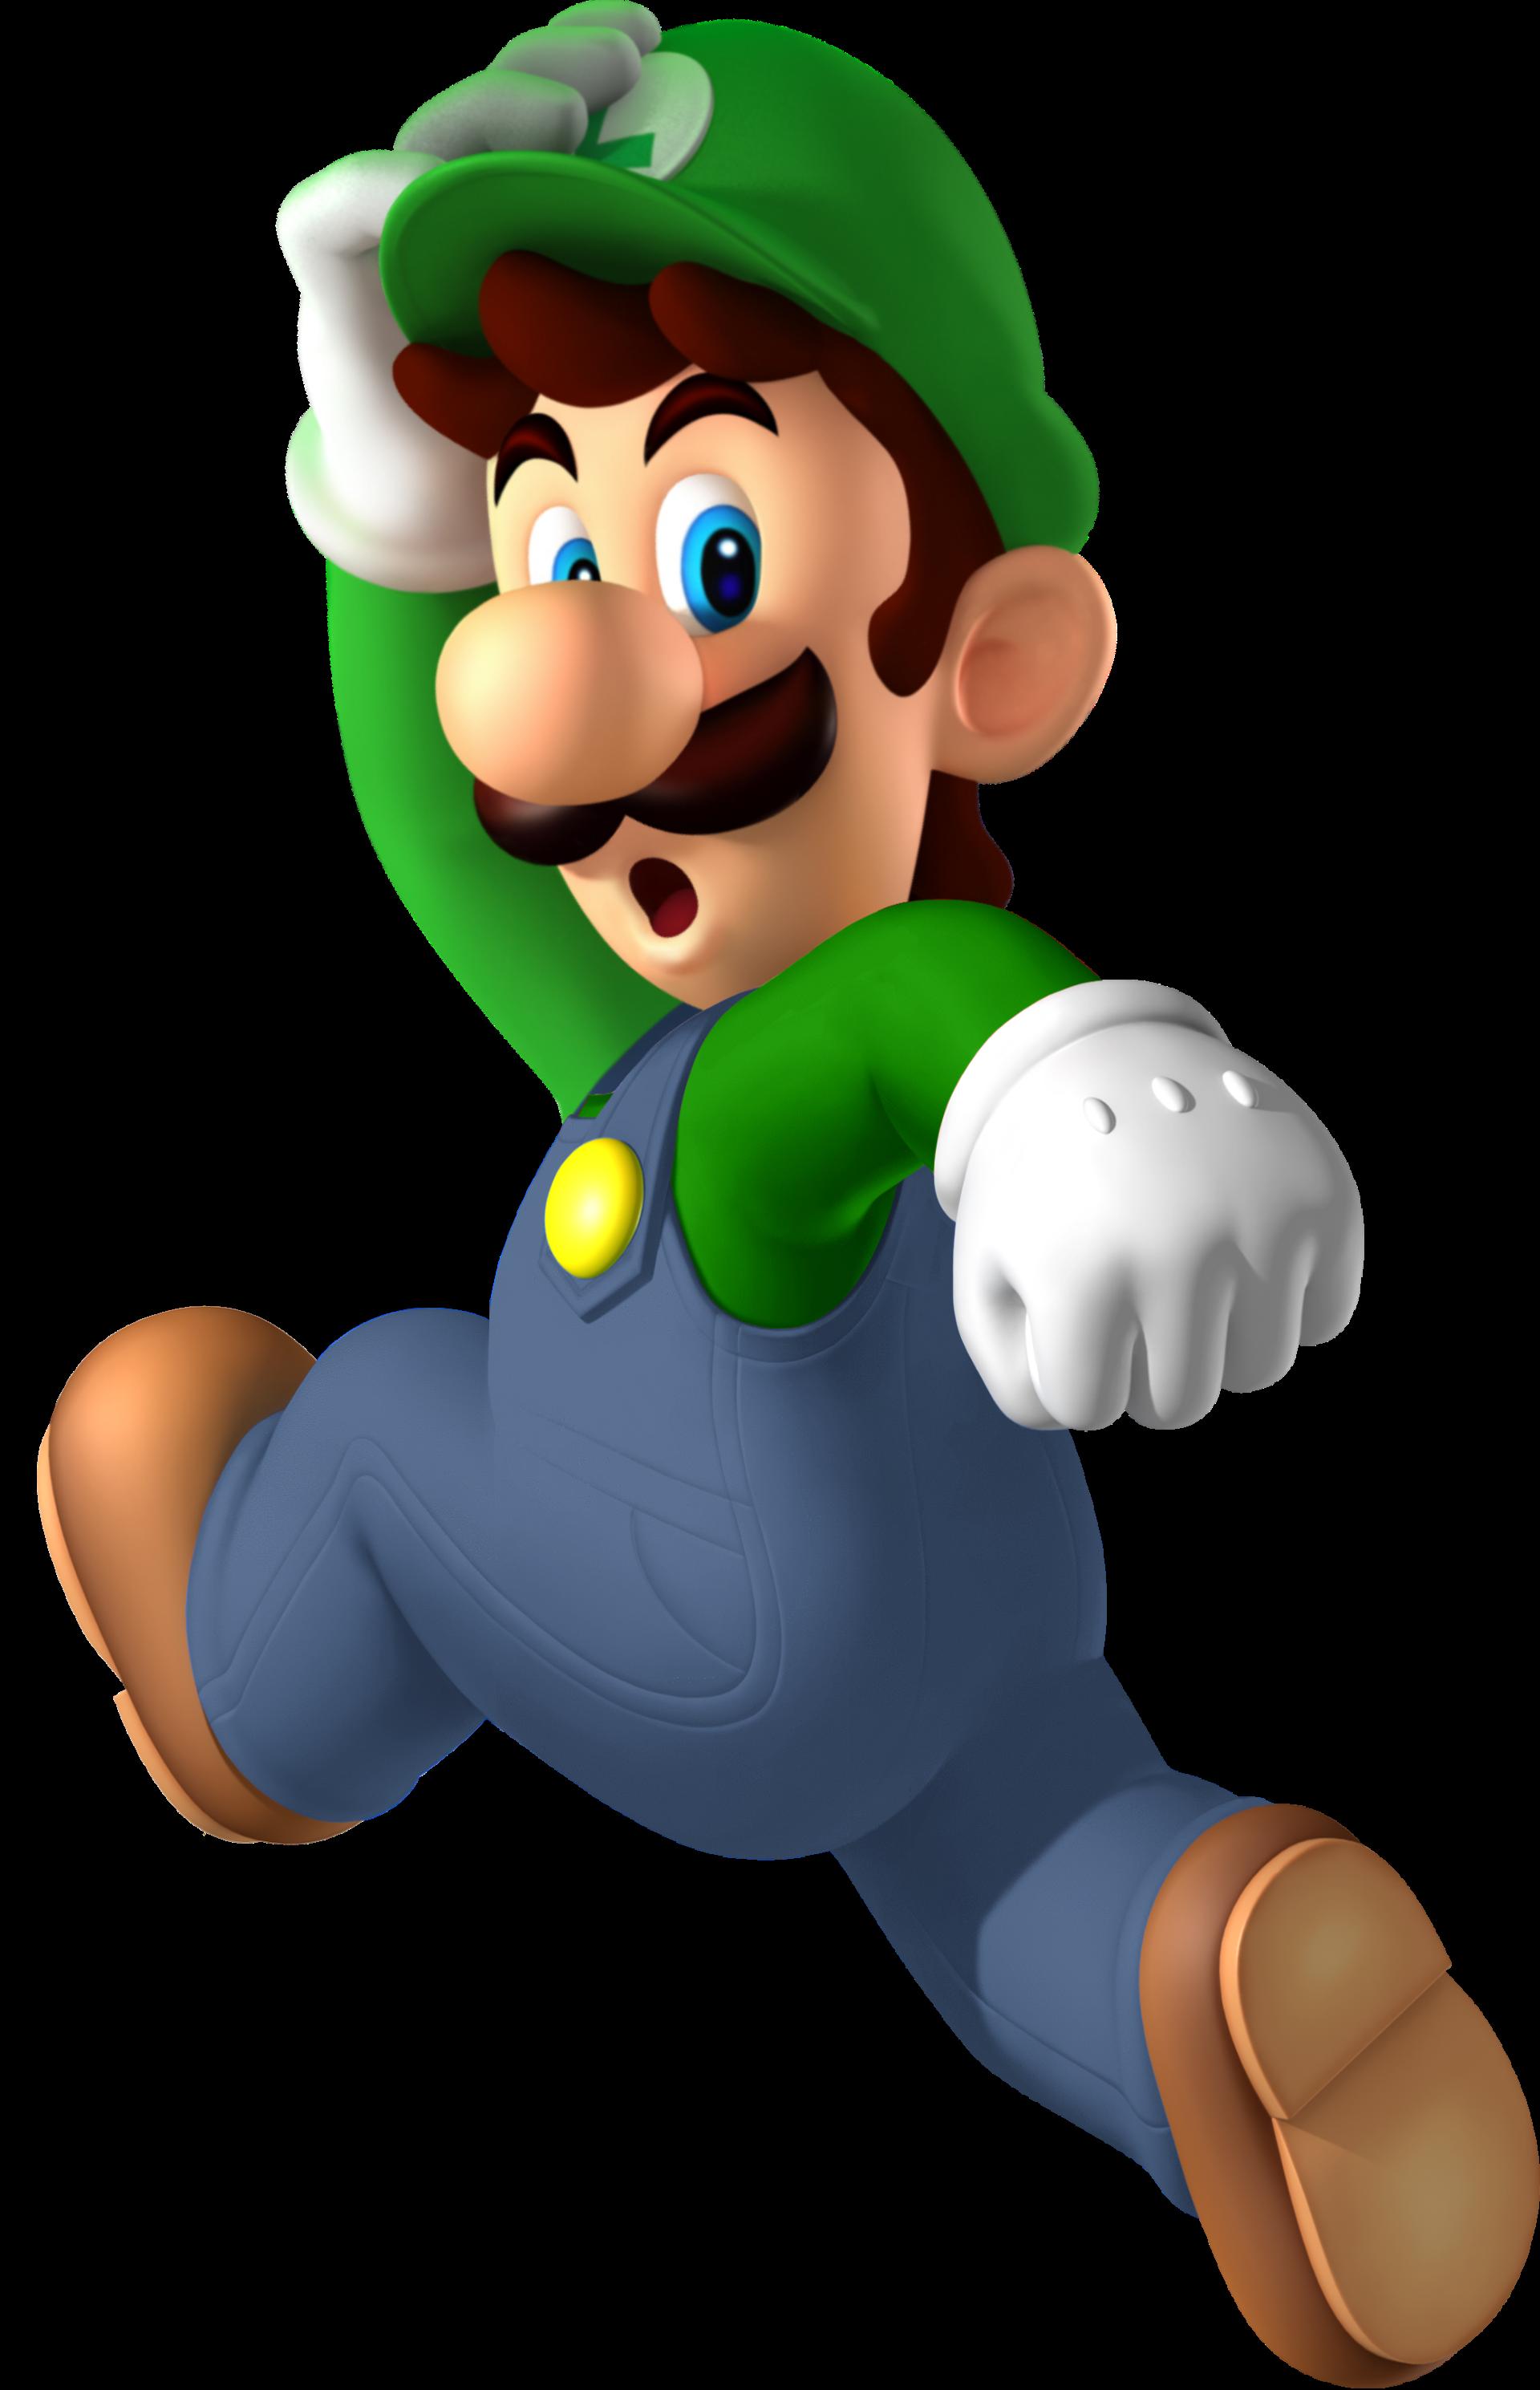 Super Mario Jumping Png Image Super Mario Run Mario Super Mario